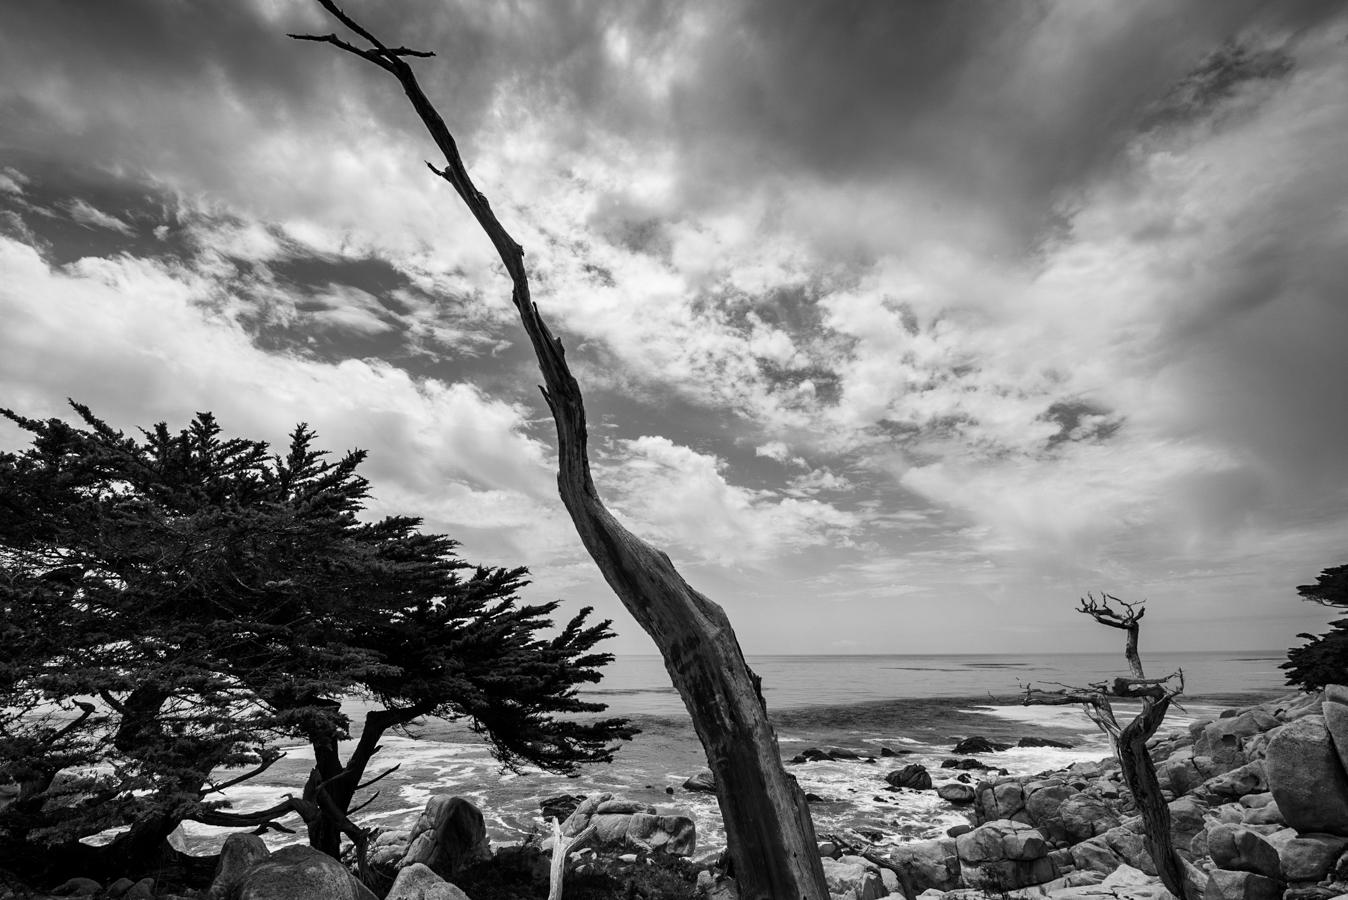 B&W California coastline